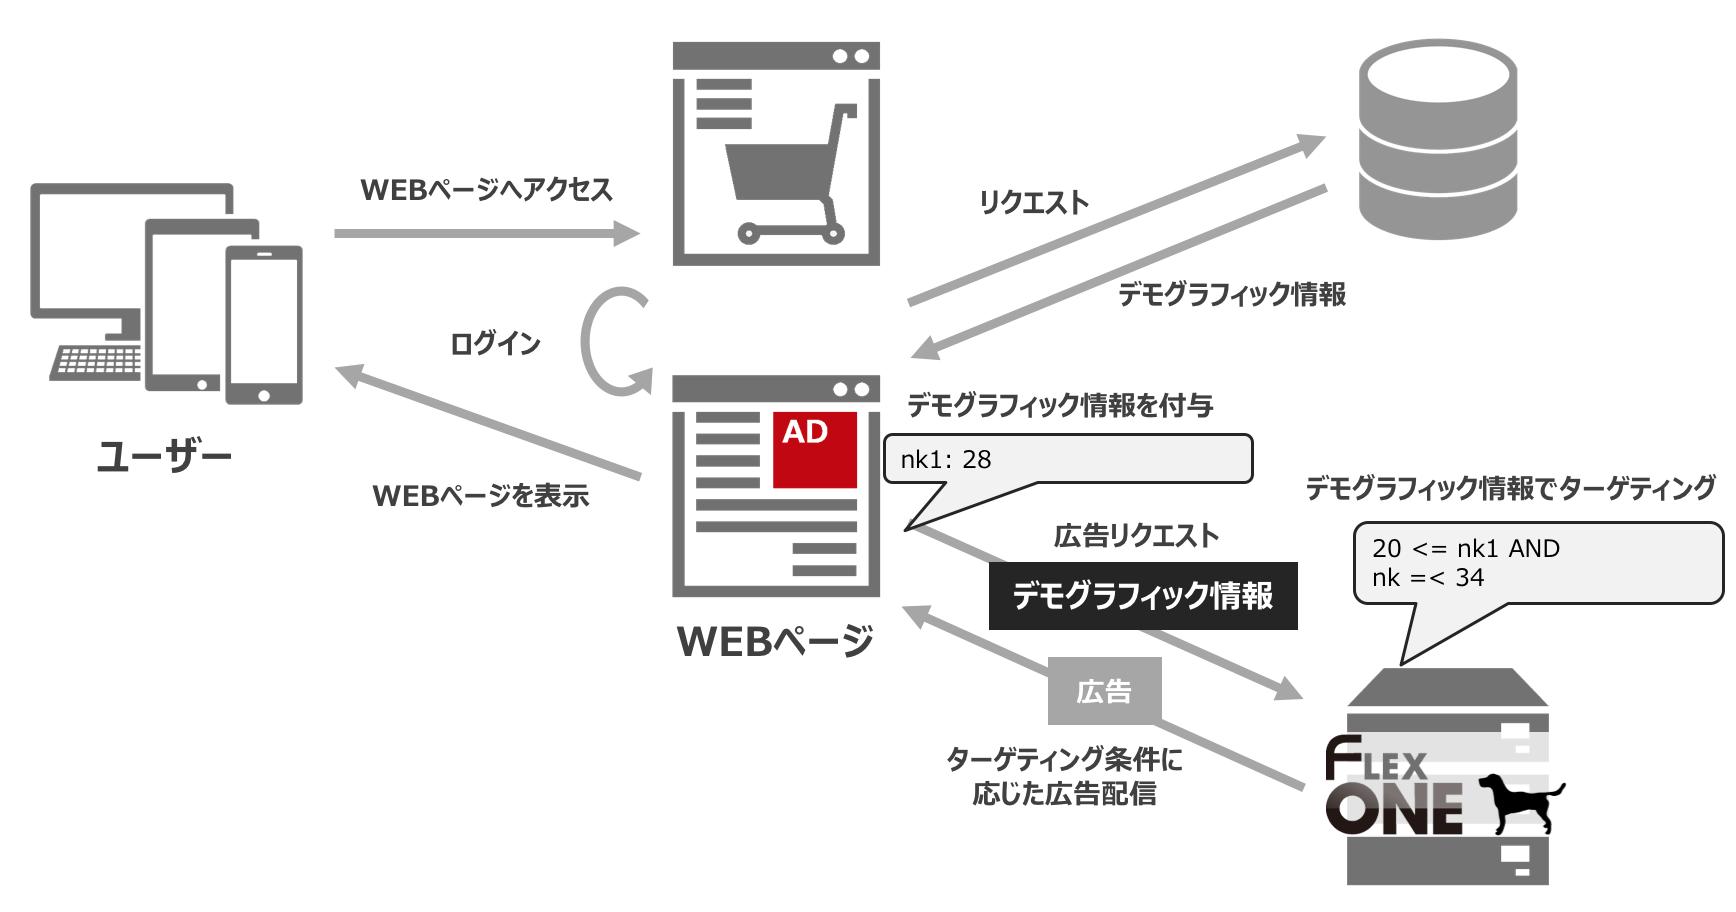 flexone-custom-targeting-image5